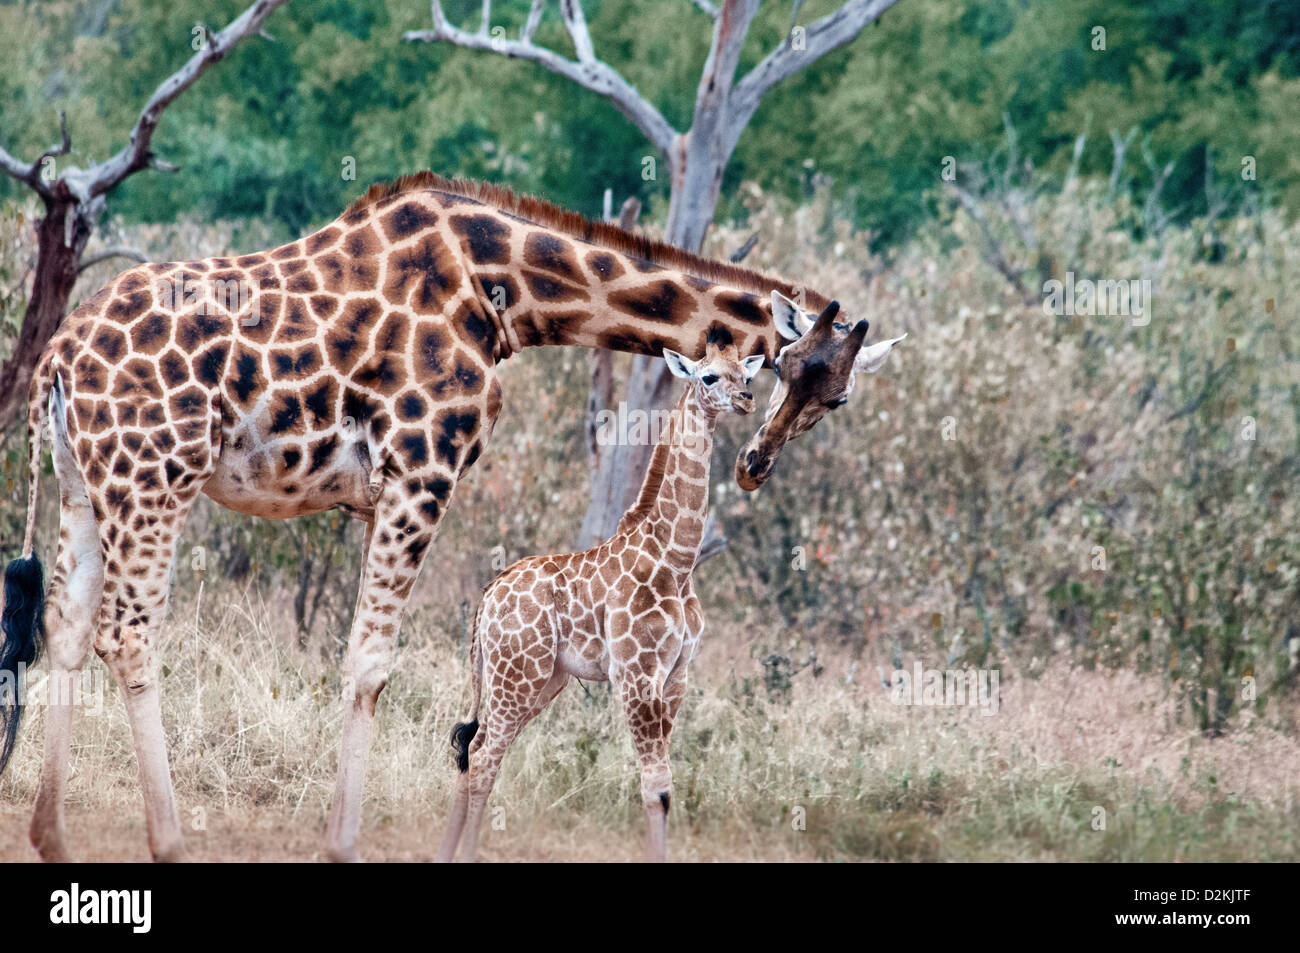 Rothschild Giraffe Mother Kissing Her Baby Giraffe Manor Nairobi